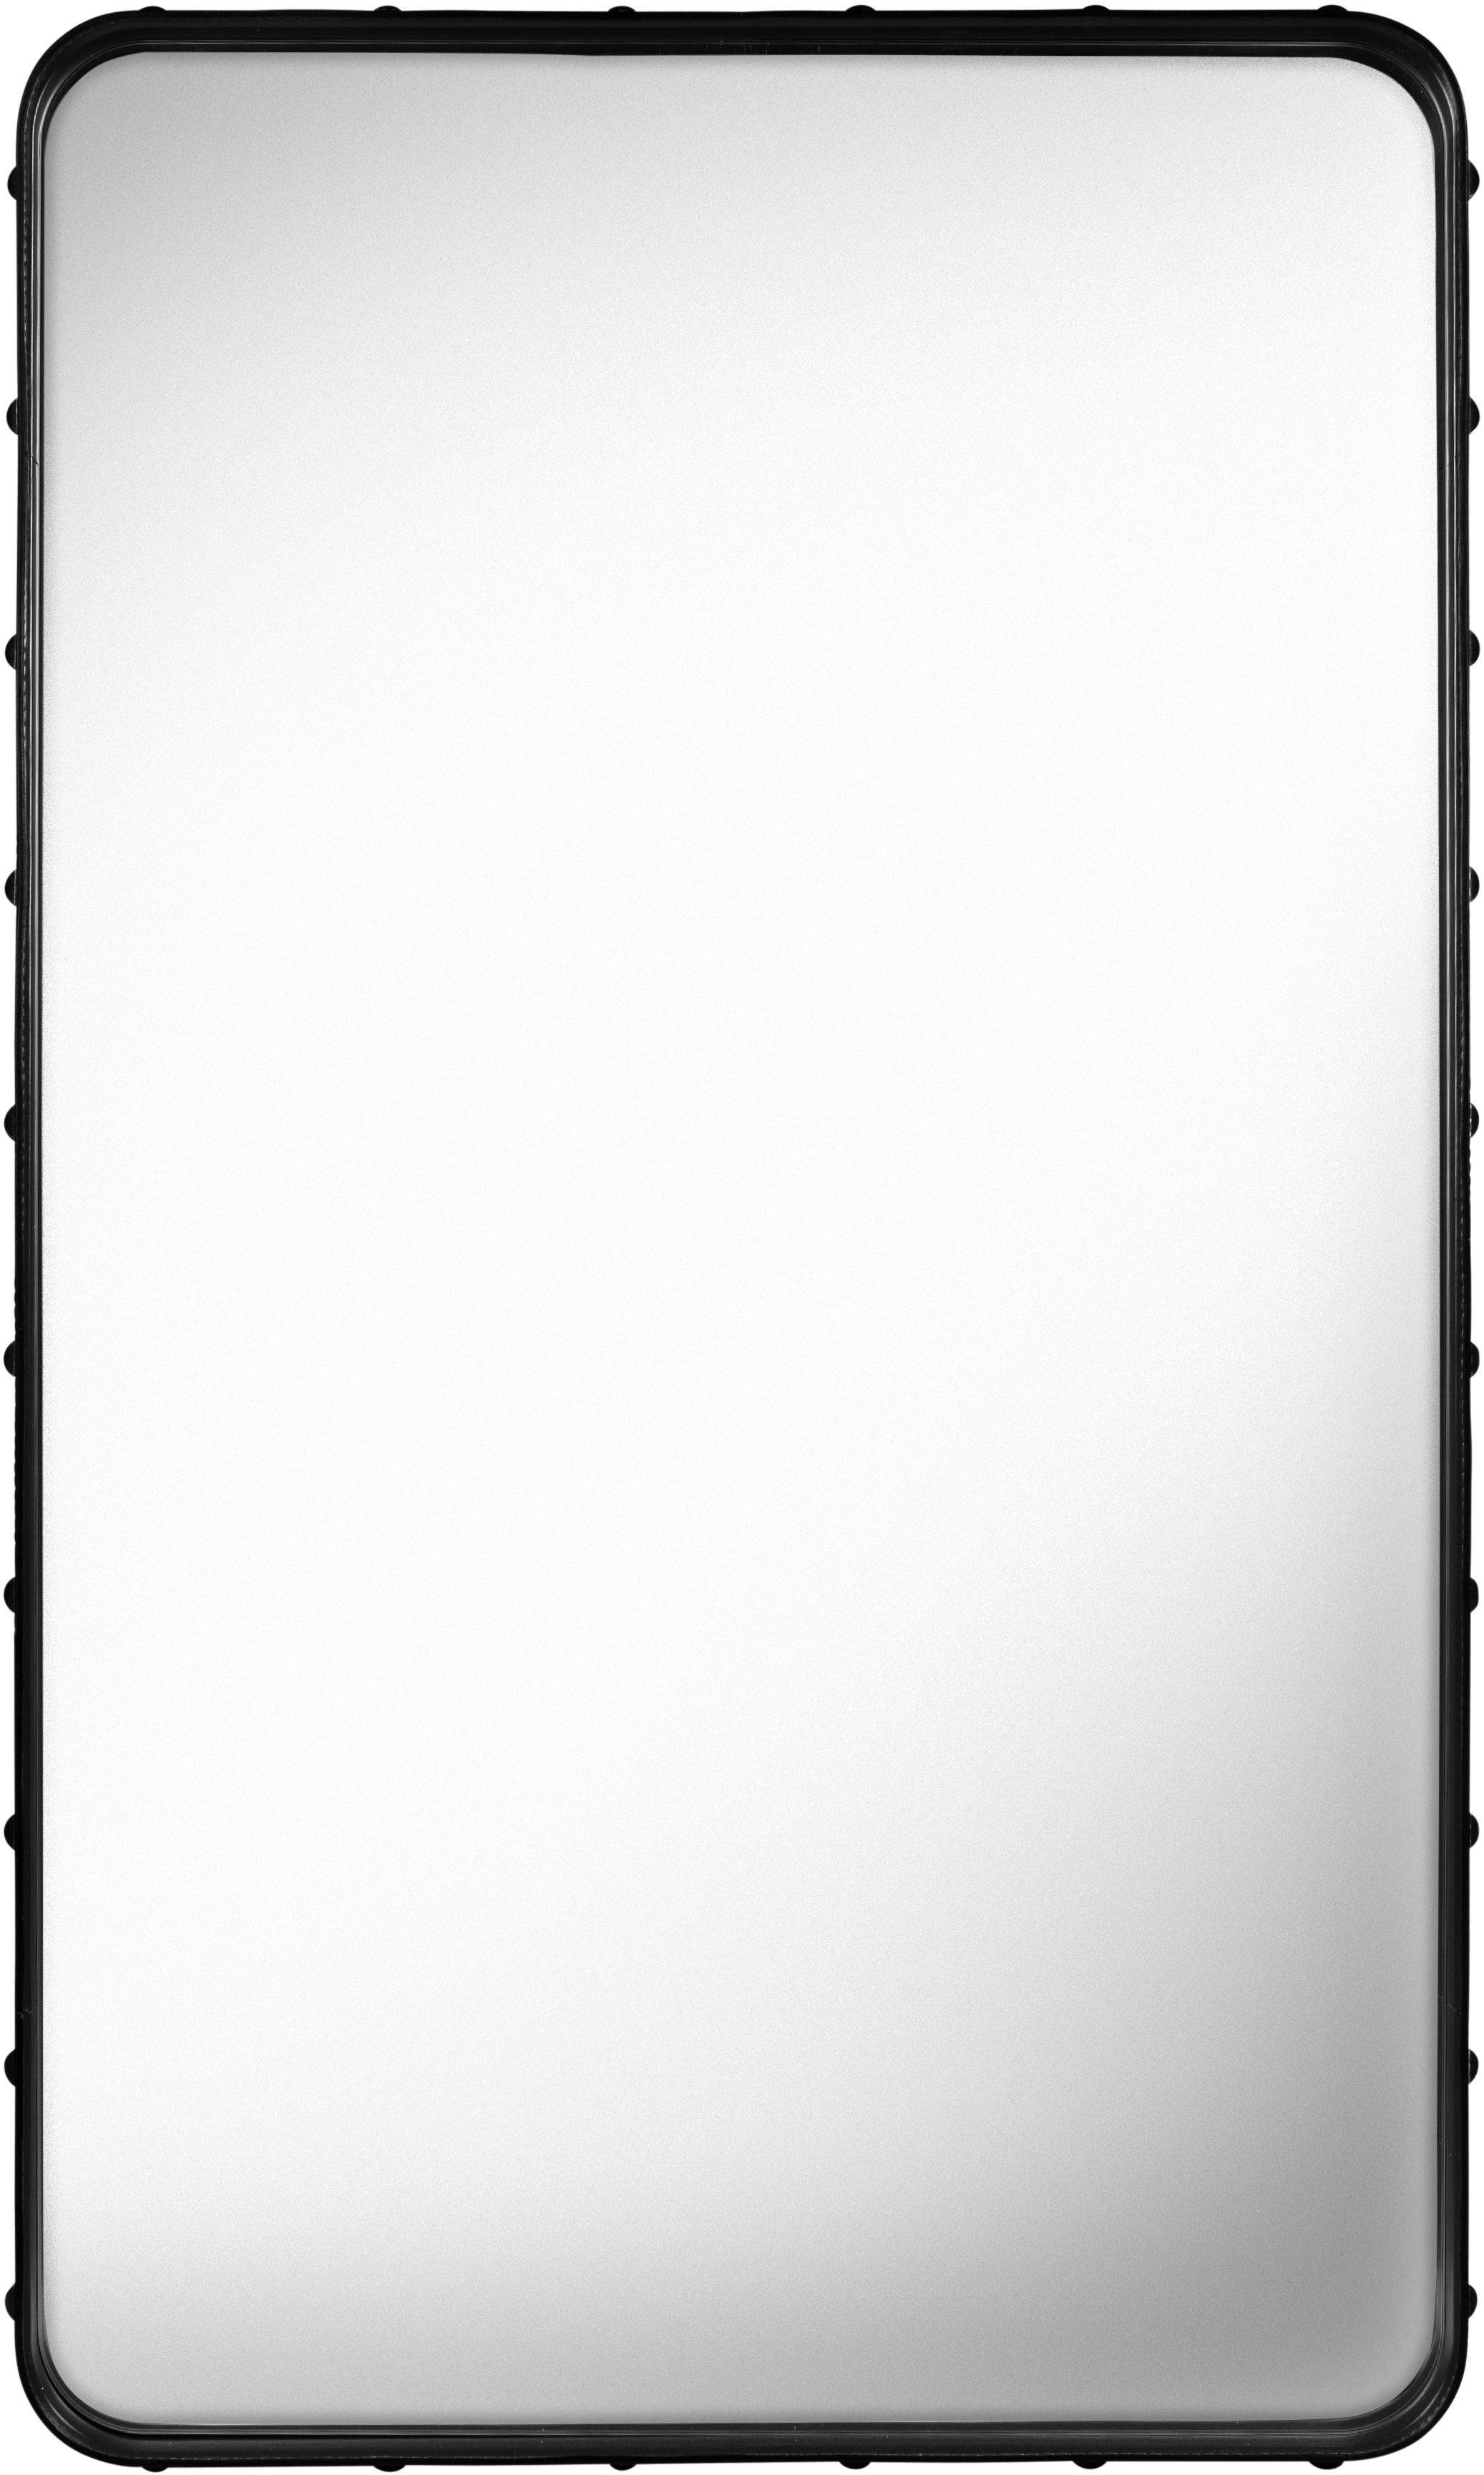 Déco - Miroirs - Miroir mural Adnet / 115 x 70 cm - Réédition 50' - Gubi - Cuir noir - Cuir, Laiton